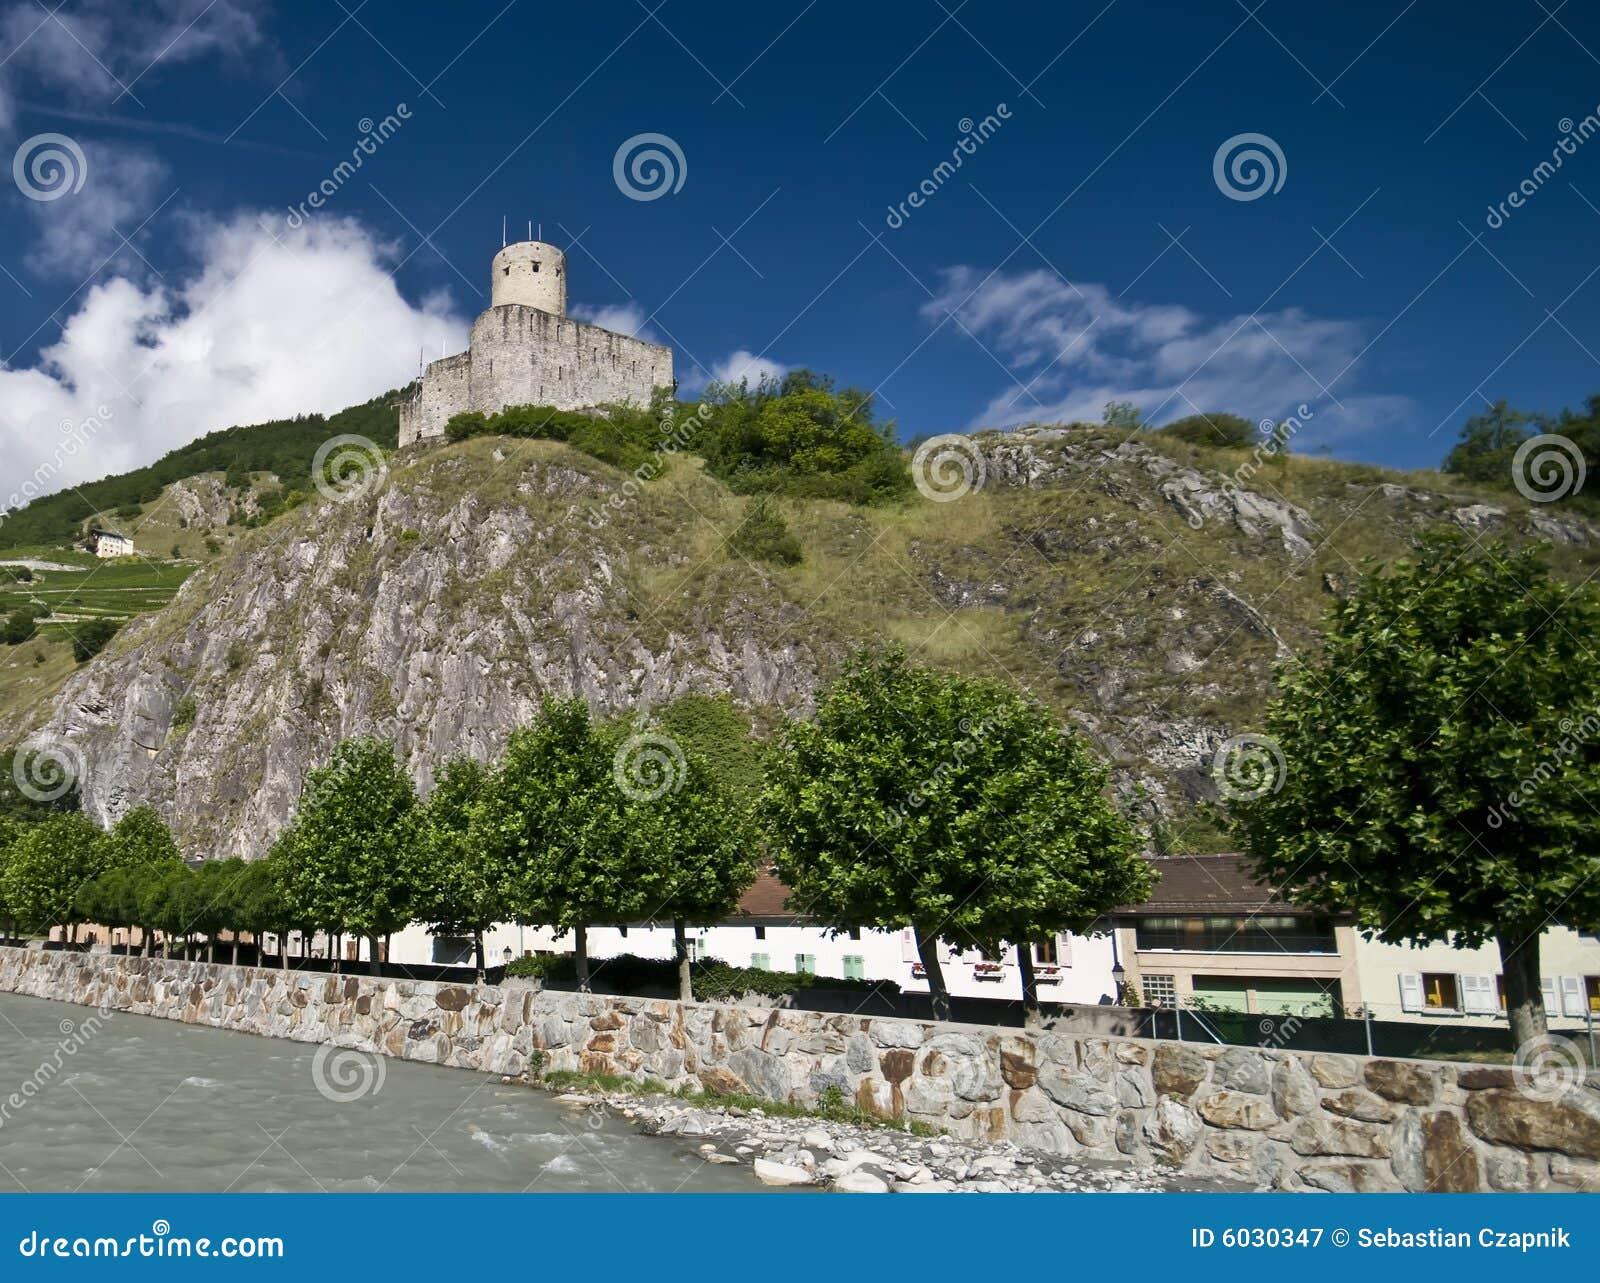 Download Martigny castle stock image. Image of castle, switzerland - 6030347